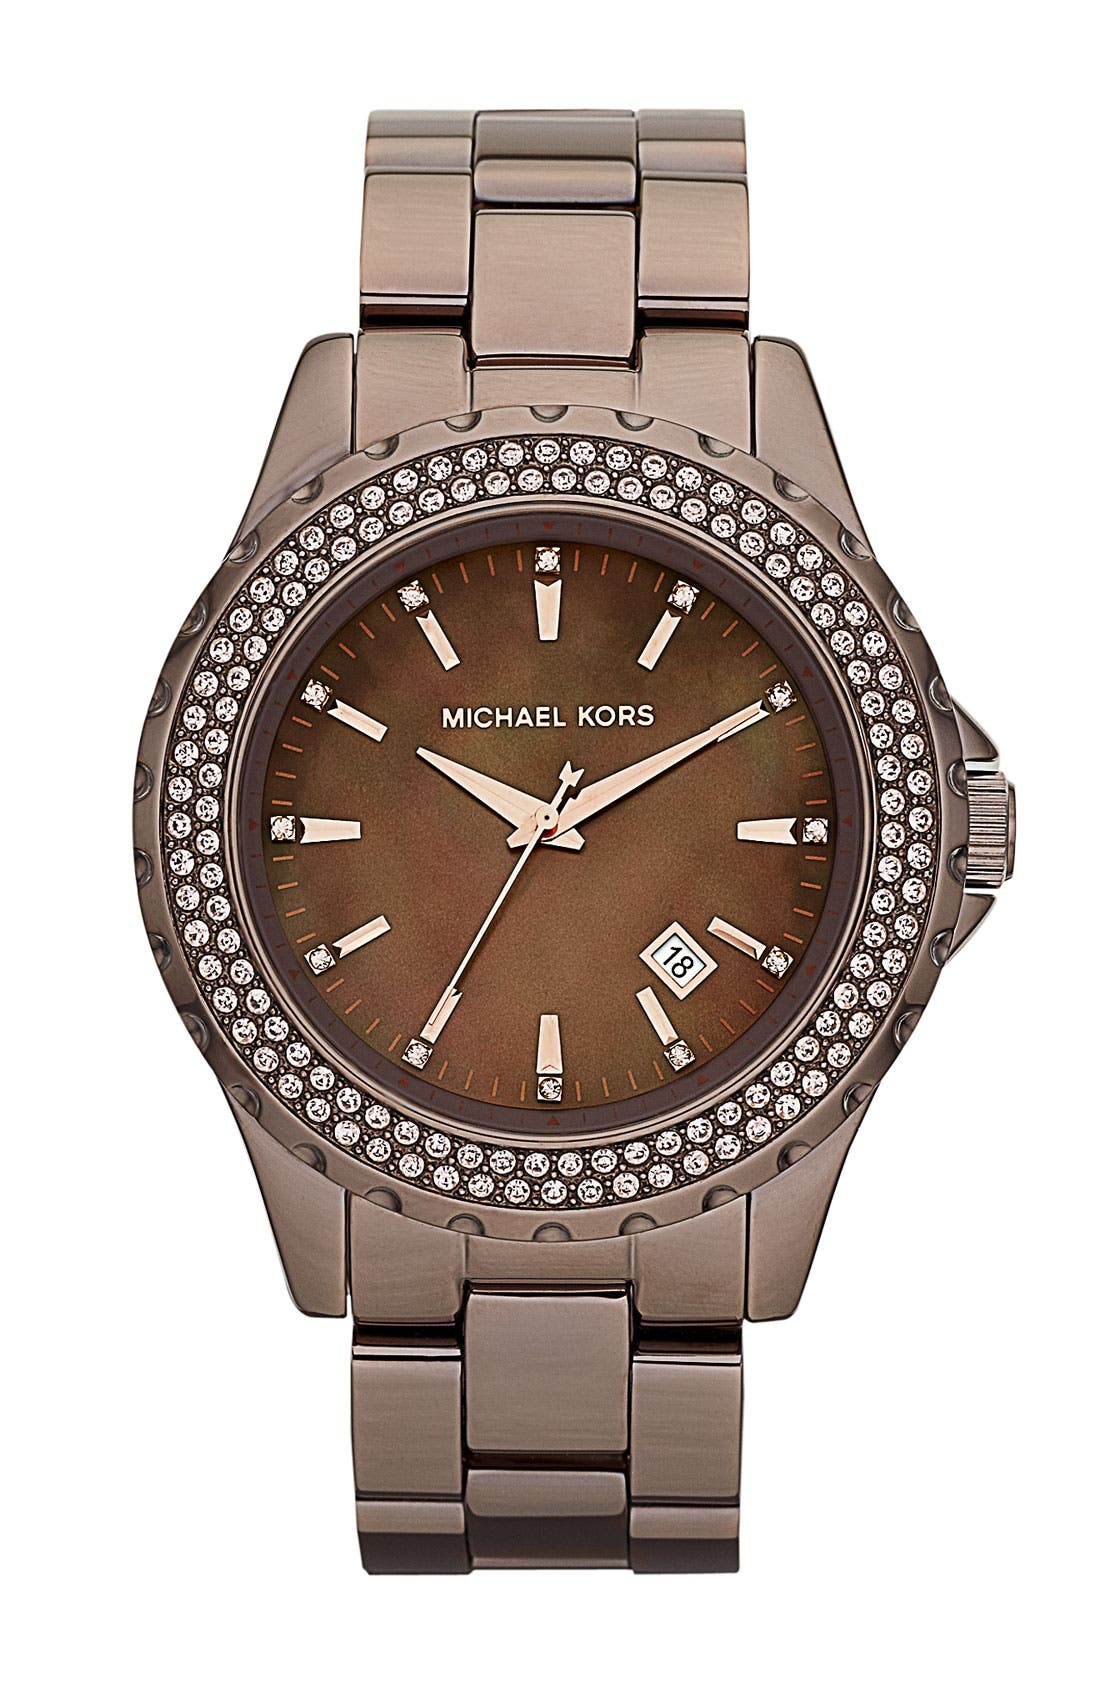 Main Image - Michael Kors 'Madison' Round Bracelet Watch, 41mm